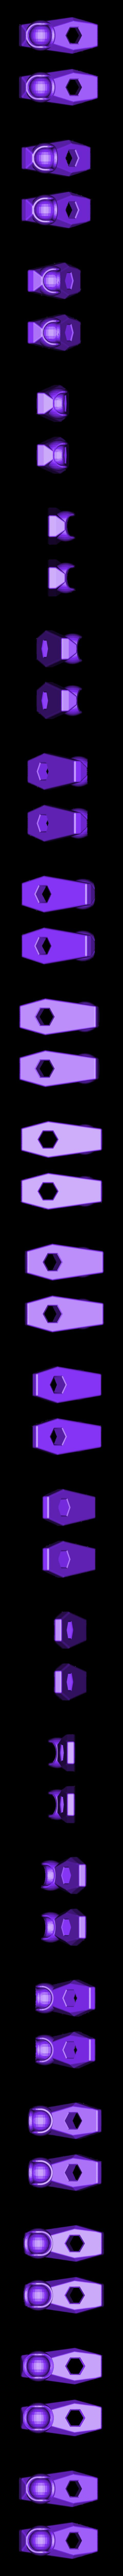 "modibot-remix-legs-feet.stl Download free STL file Modibot action figure ""easy print"" remix • 3D printer design, firebird"